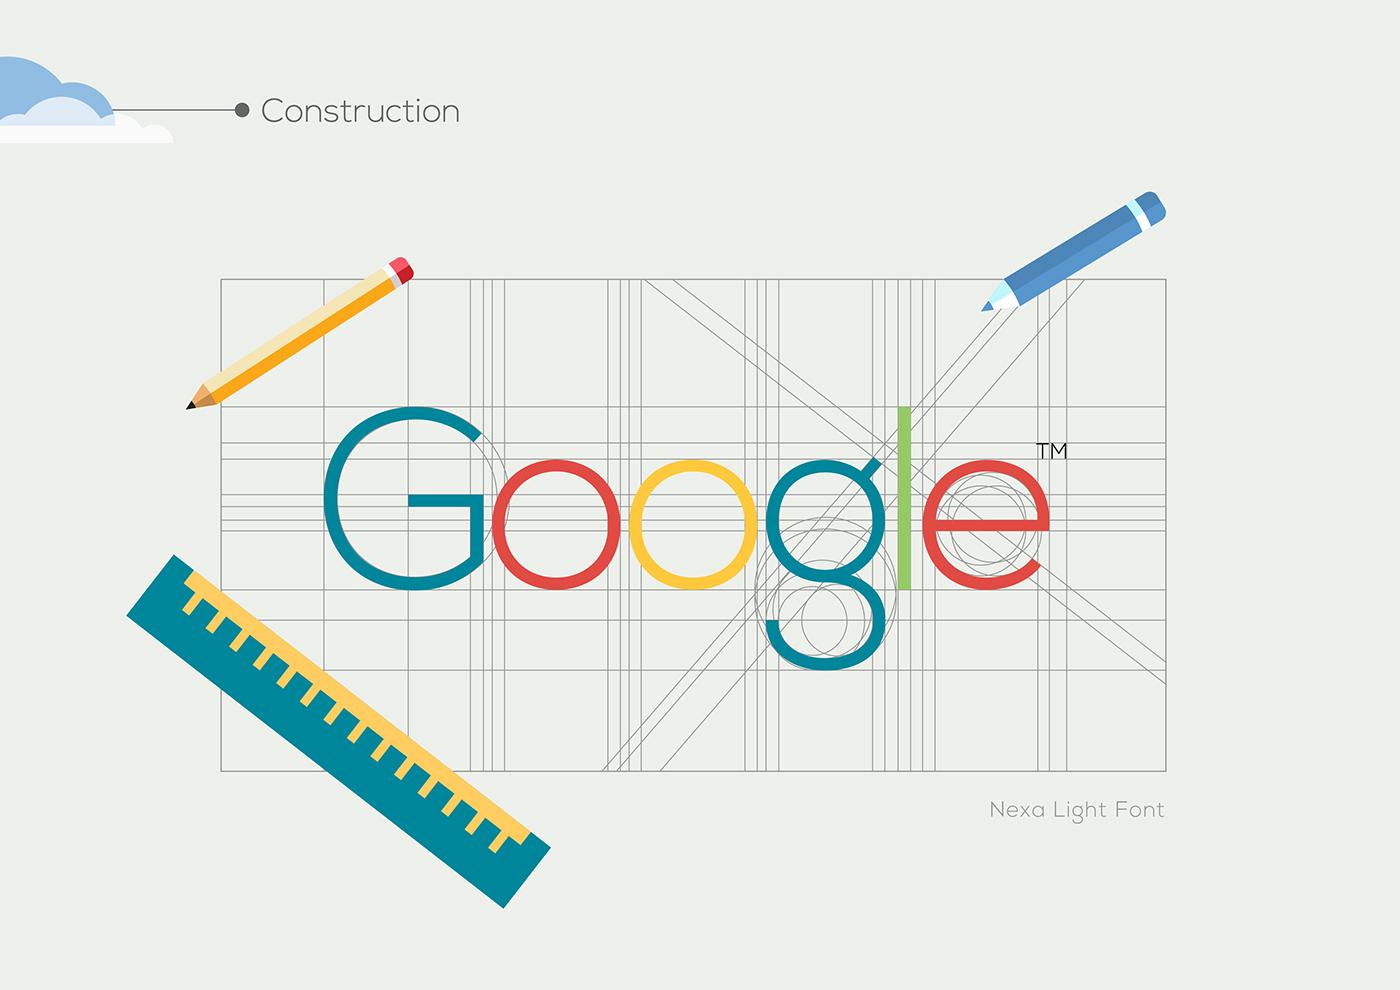 google logo rebranding Style design graphic Project Illustrator mac Computer Internet print pantone color app